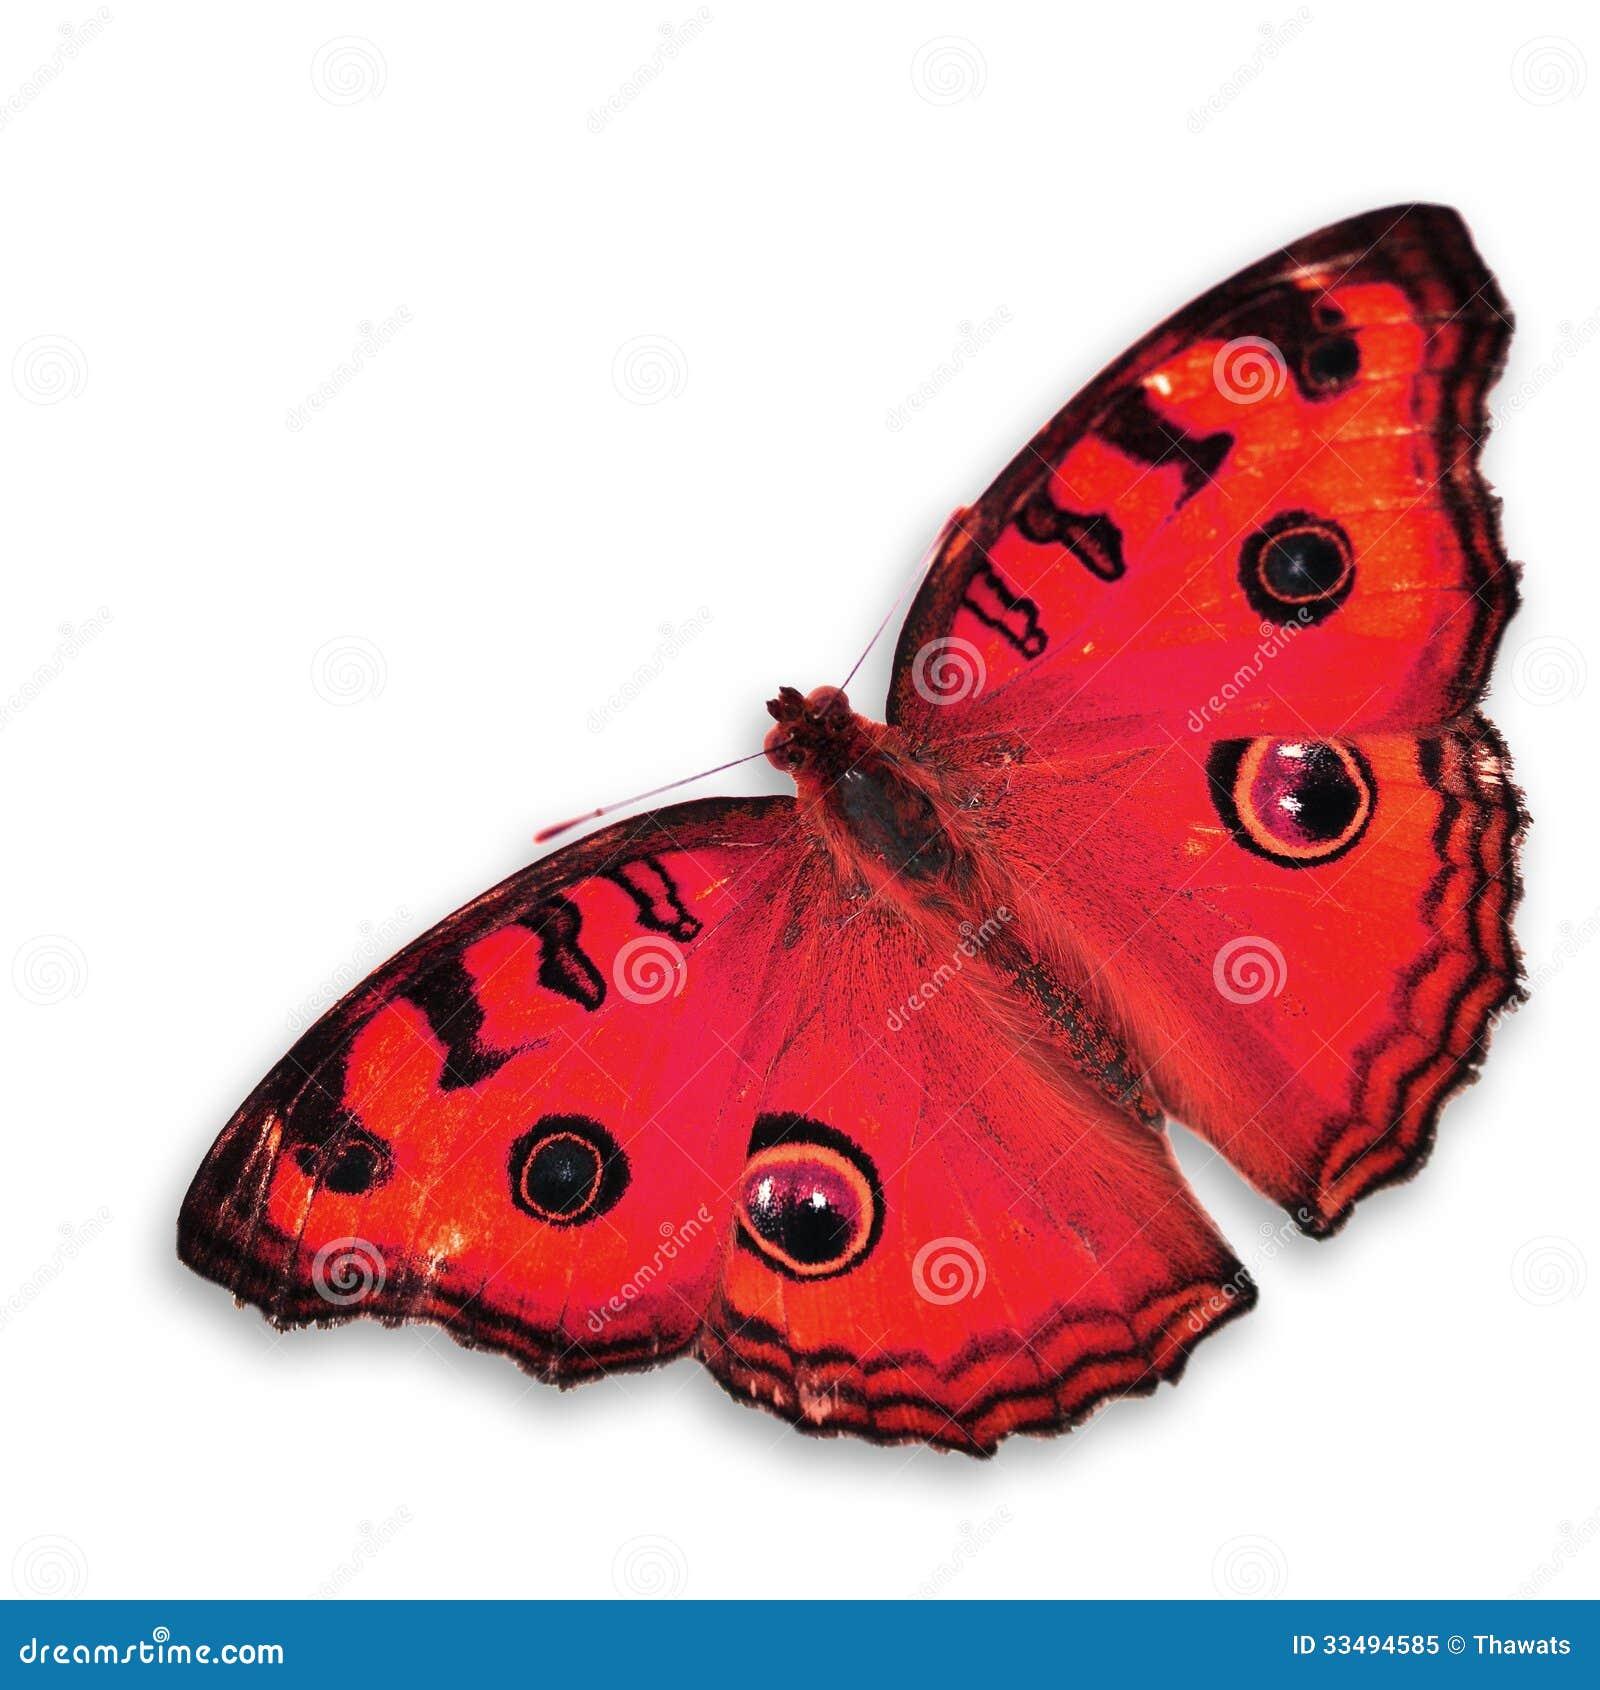 papillon rouge image stock image du rouge papillon 33494585. Black Bedroom Furniture Sets. Home Design Ideas